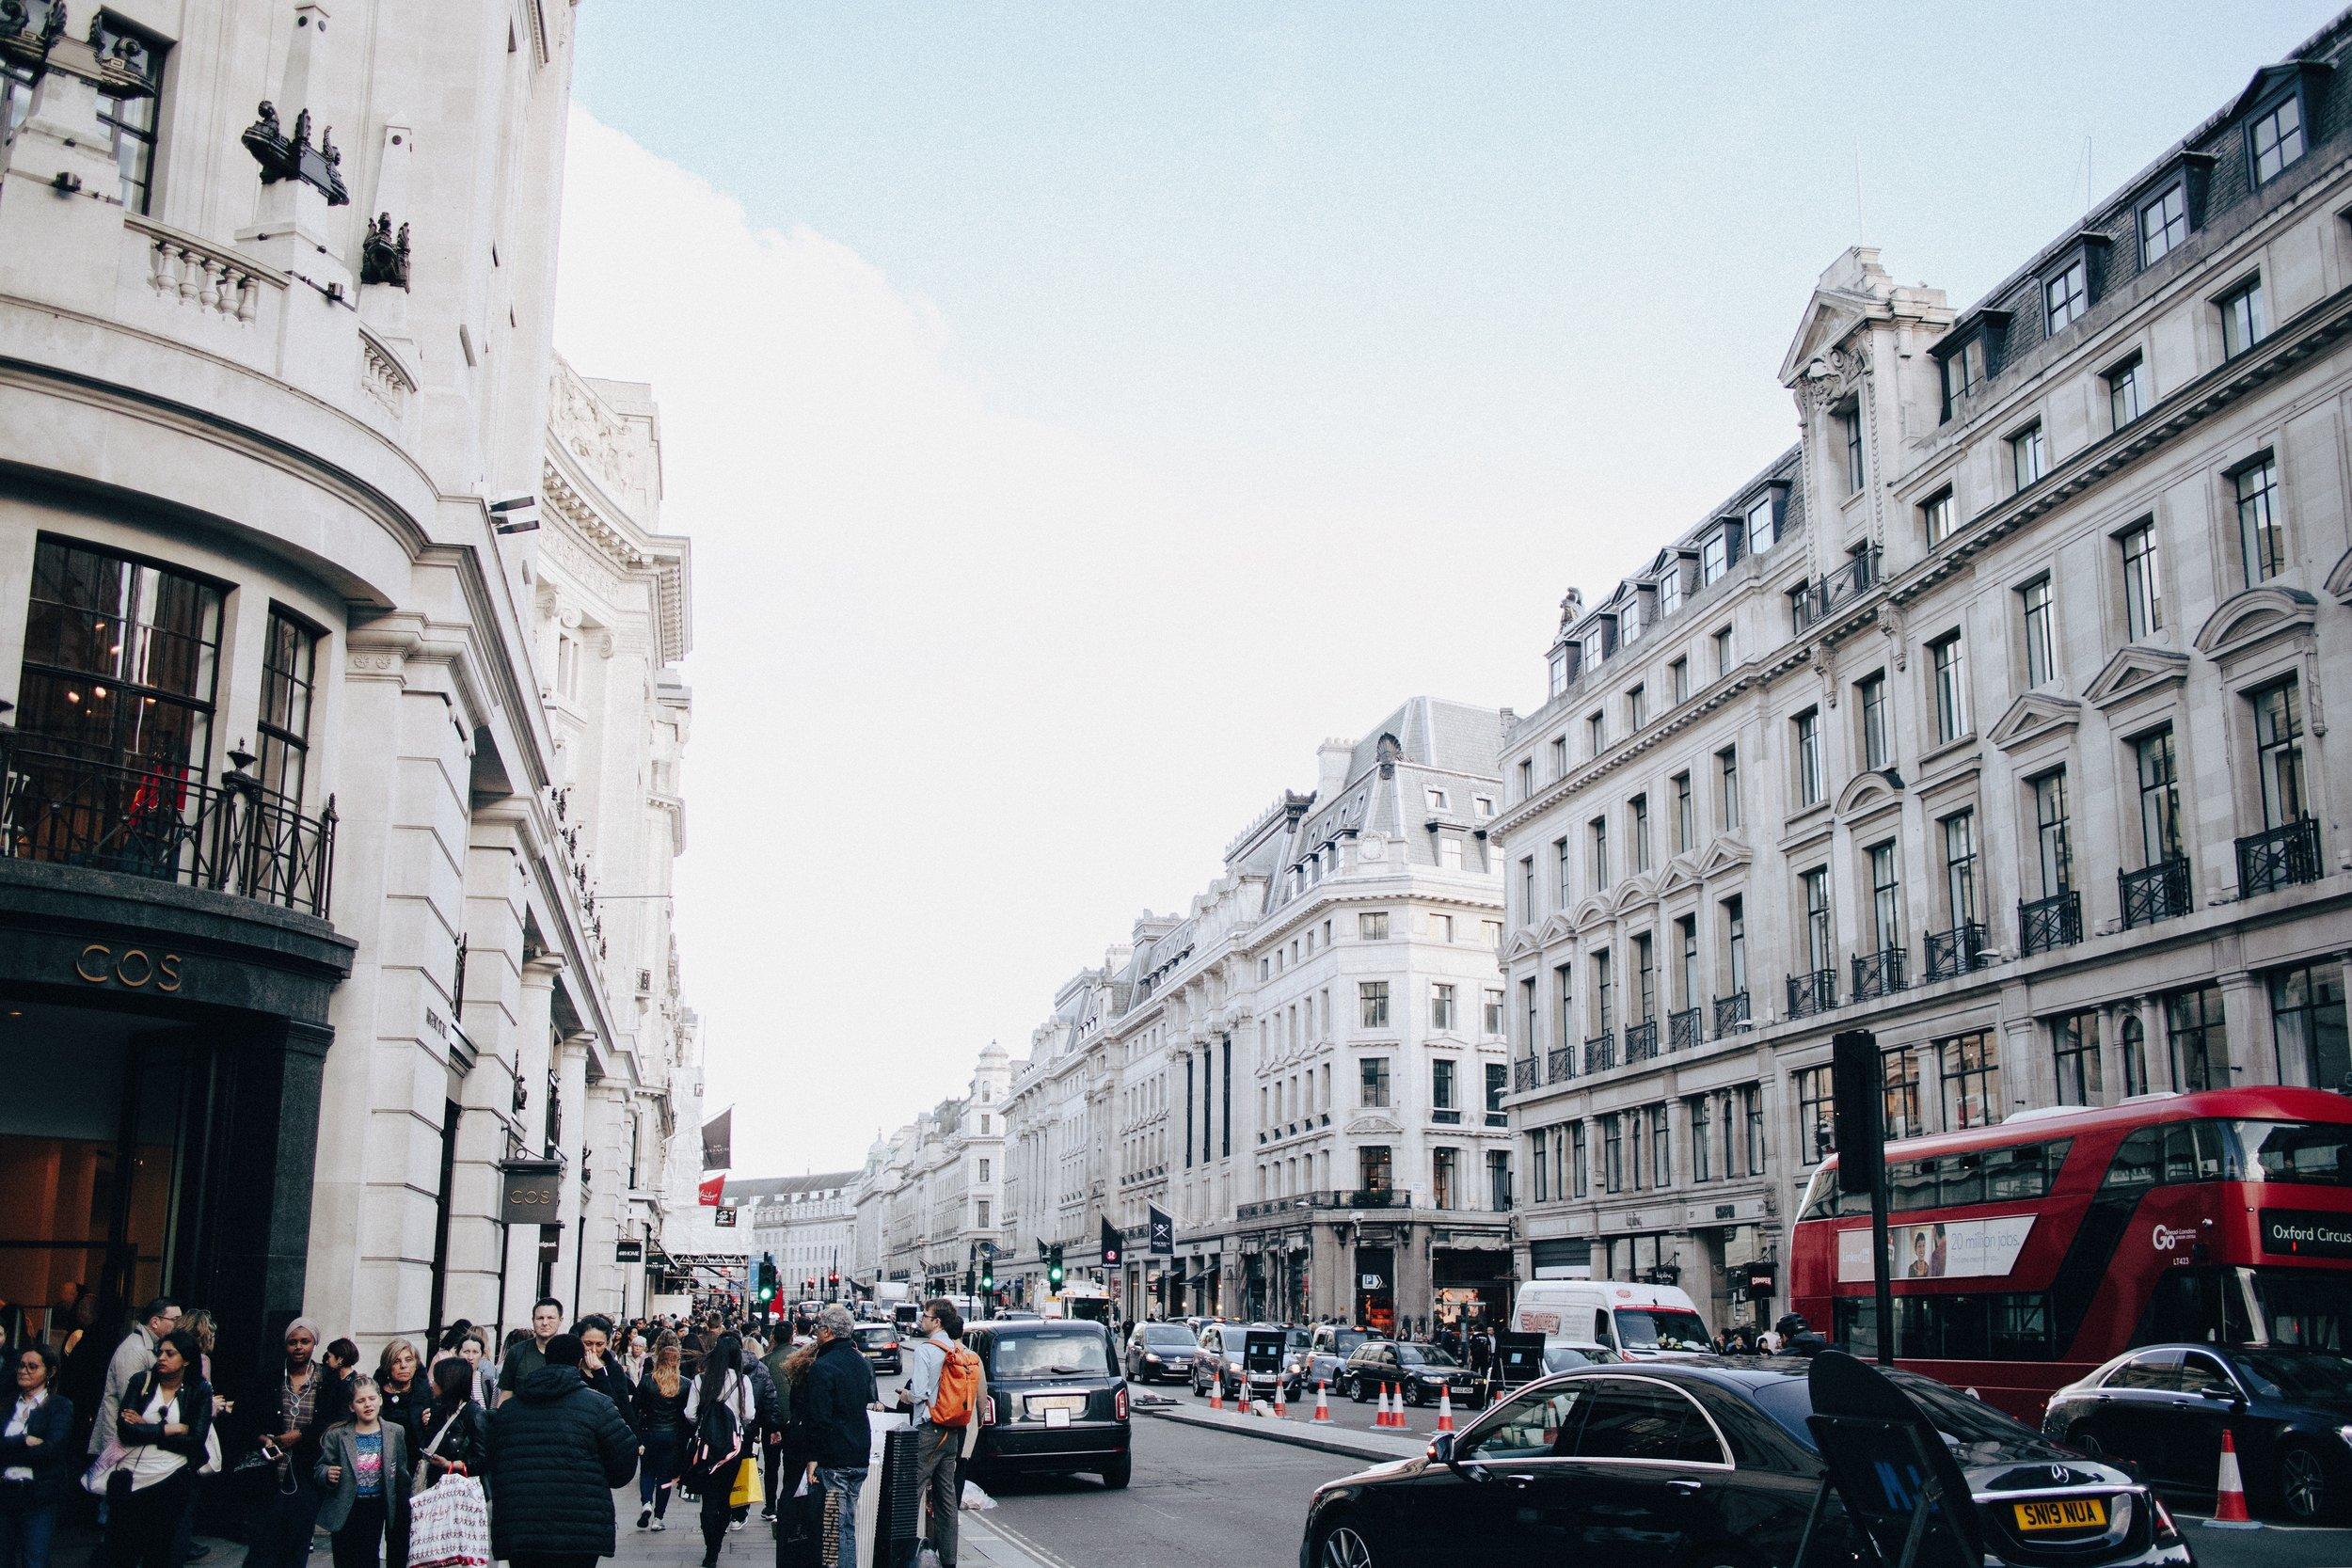 london-travel-diary-33.jpg